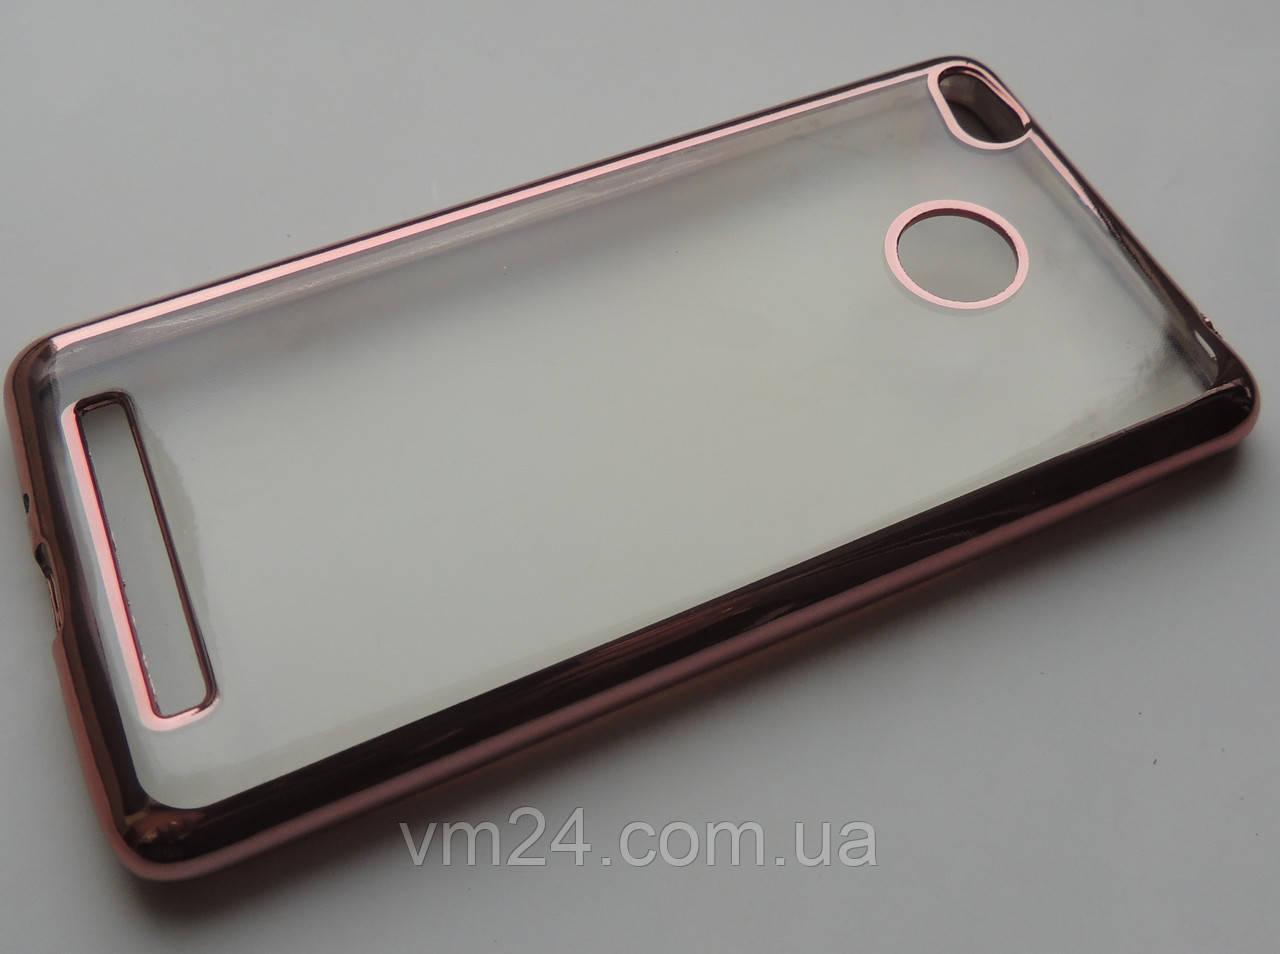 TPU чехол Xiaomi Redmi 3s, 3 Pro Gold Roze